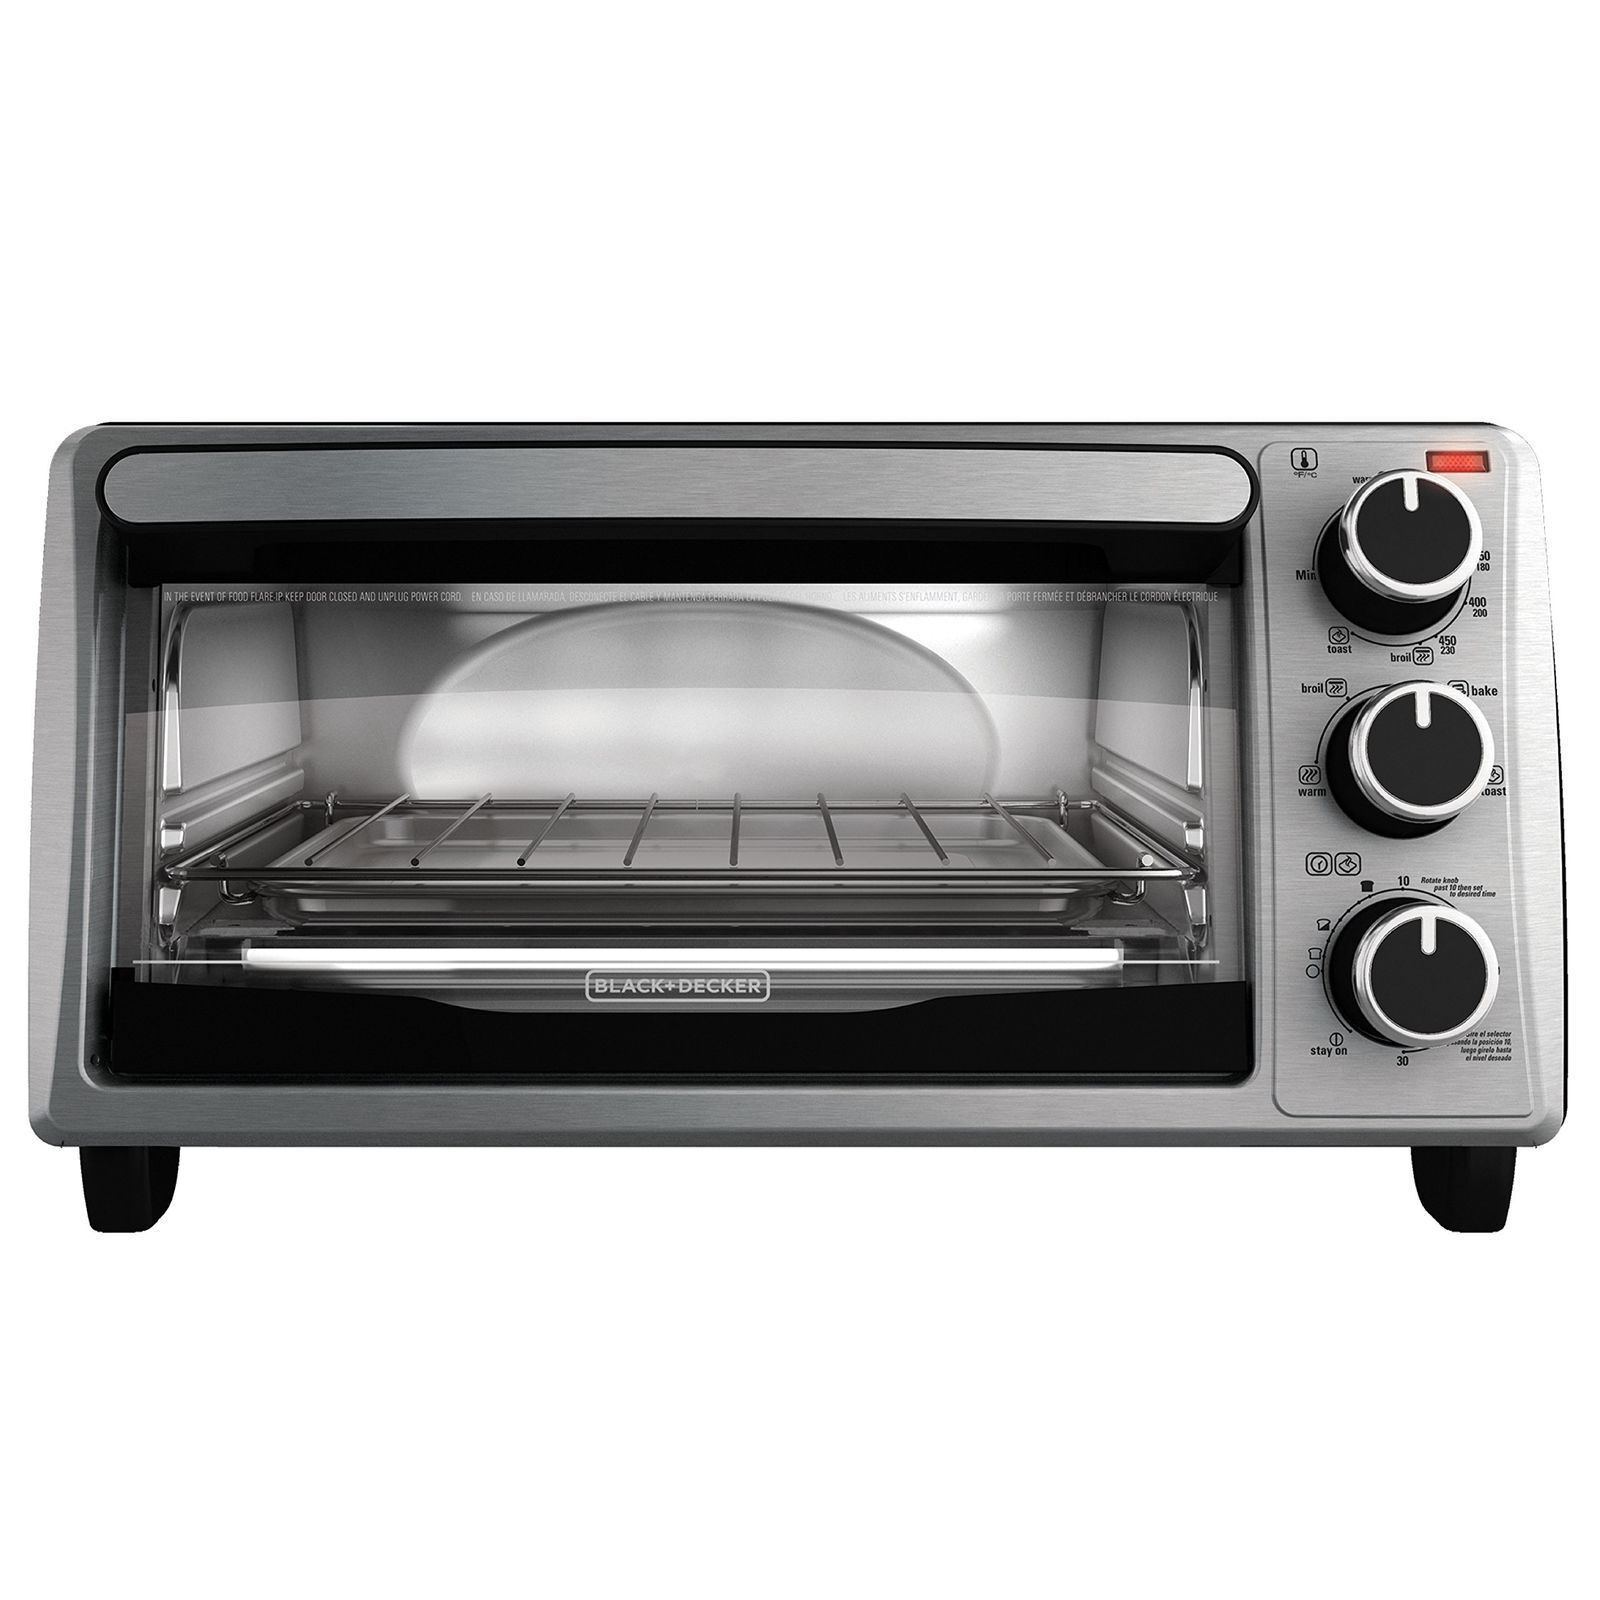 BLACK+DECKER 4-Slice Toaster Oven, Stainless Steel, TO1303SB